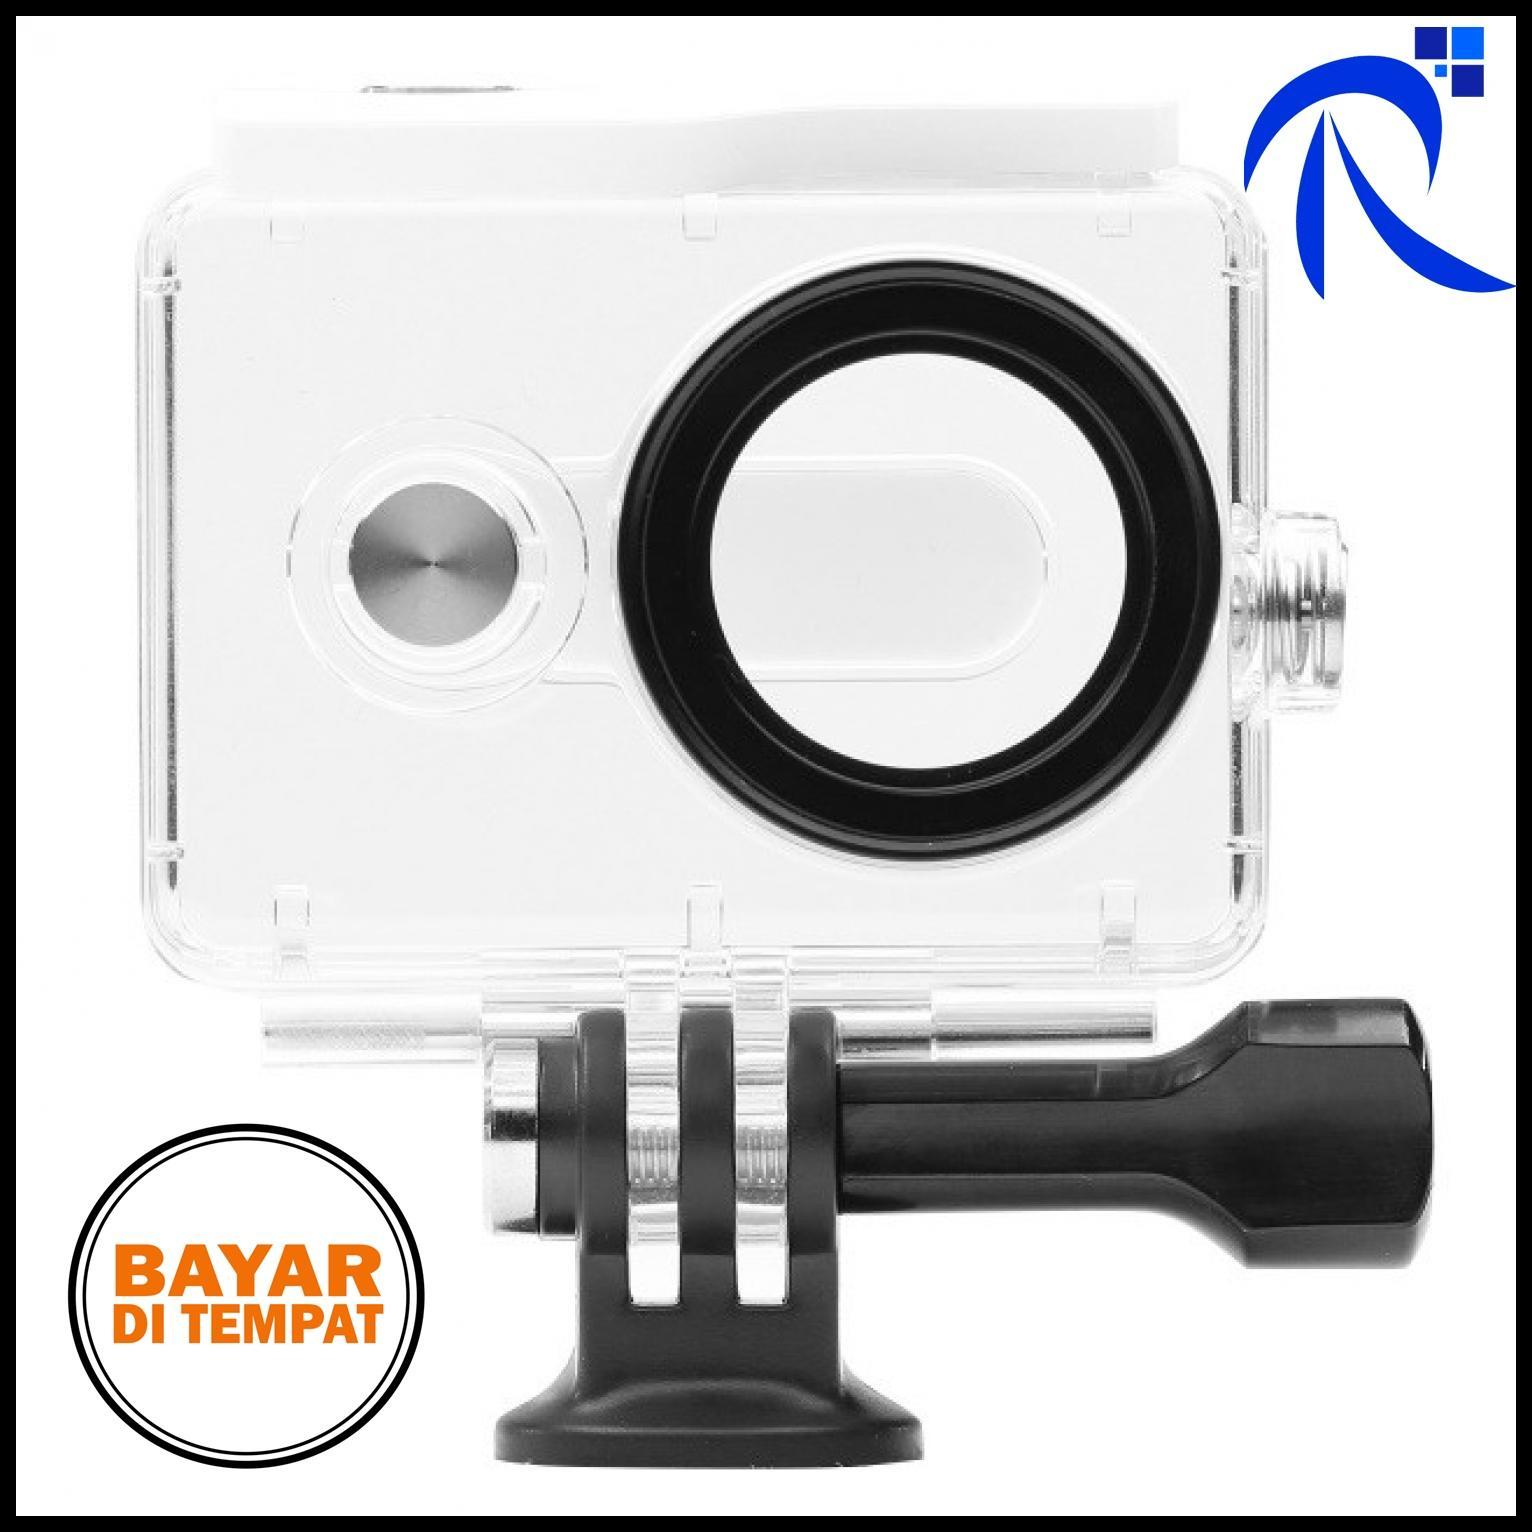 Xiaomi Underwater Waterproof Case IPX68 40m for Xiaomi Yi Sports Camera (ORIGINAL) - White / Putih